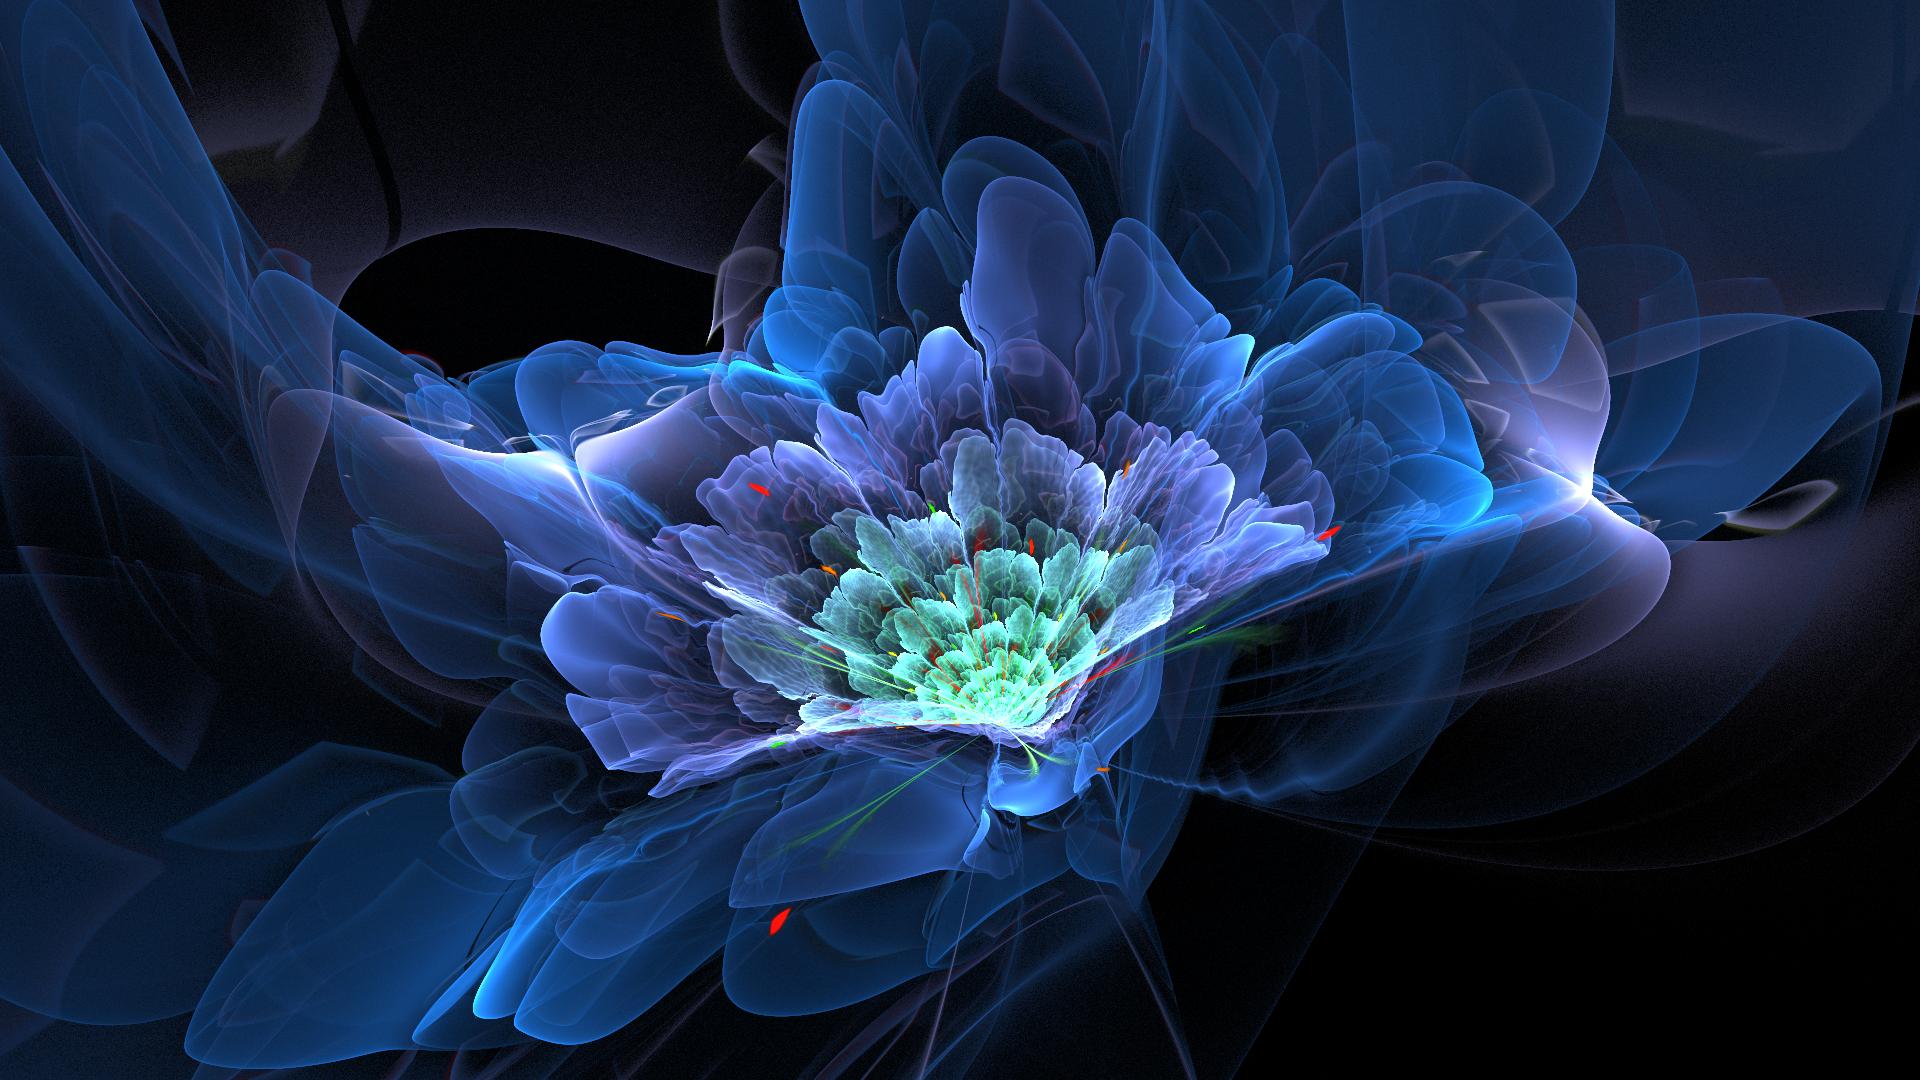 free computer wallpaper for fractal